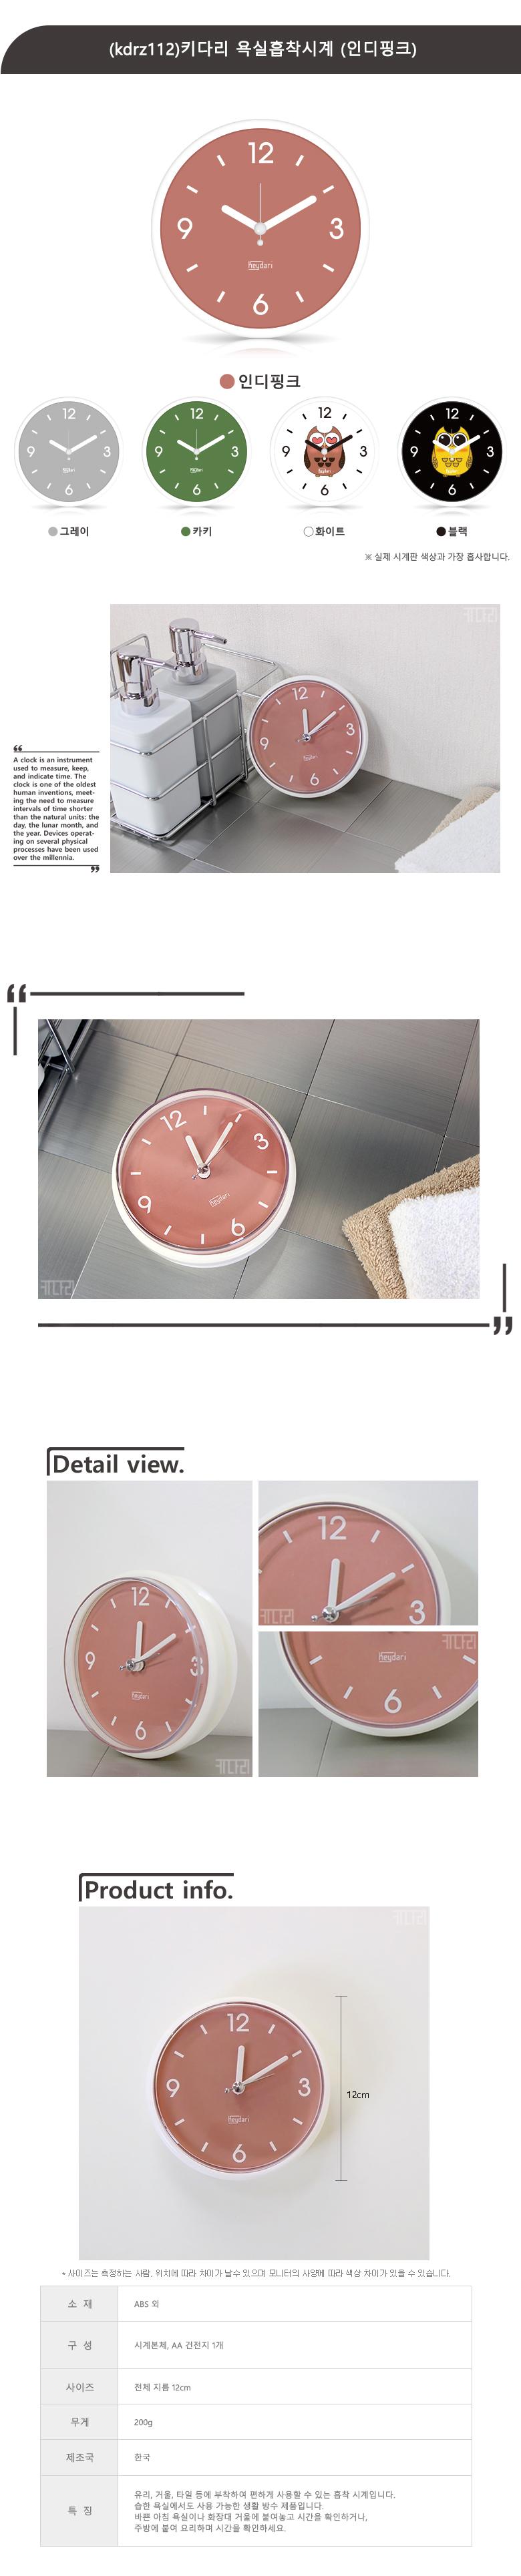 (kdrz112)키다리 욕실흡착시계 (인디핑크)8,900원-키다리인테리어, 시계, 벽시계, 흡착바보사랑(kdrz112)키다리 욕실흡착시계 (인디핑크)8,900원-키다리인테리어, 시계, 벽시계, 흡착바보사랑